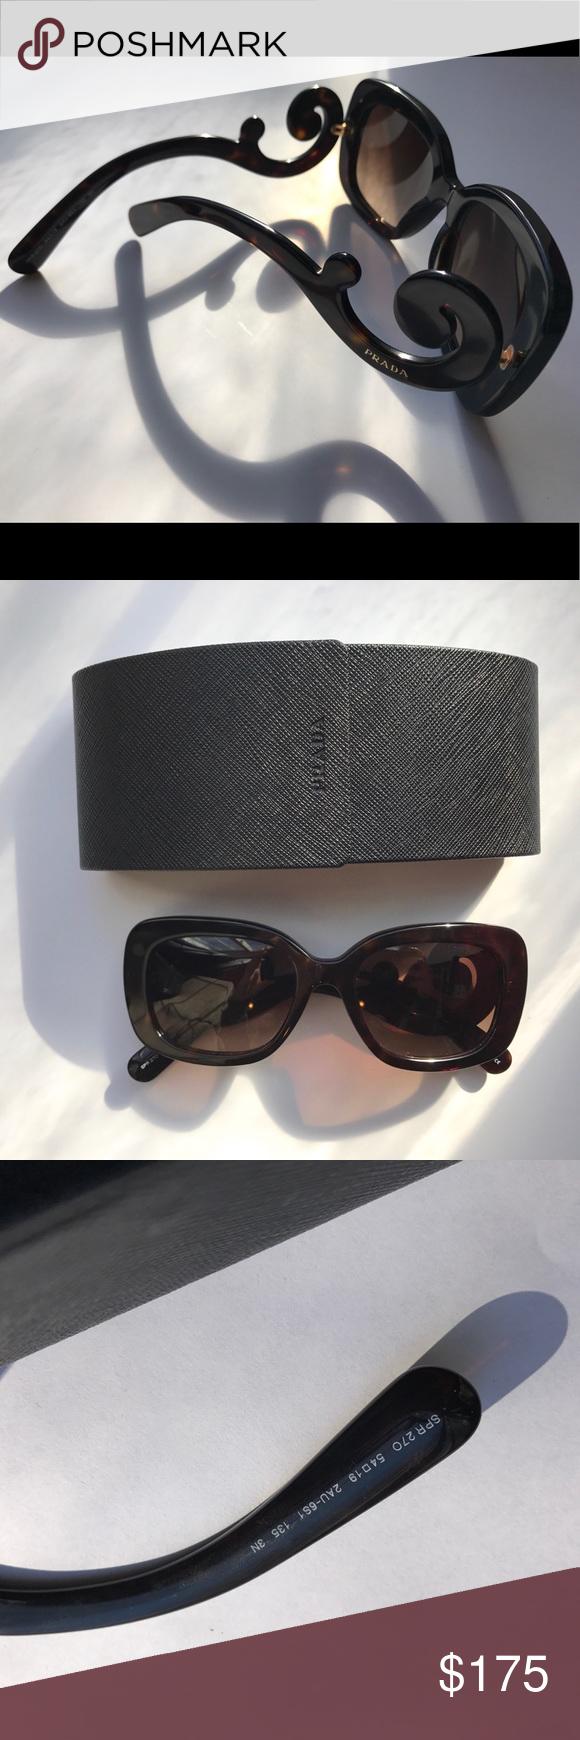 4aa97738e0a ... closeout prada sunglasses rectangular prada sunglasses tortoise color  frame lightly worn. absolutely no scratches.